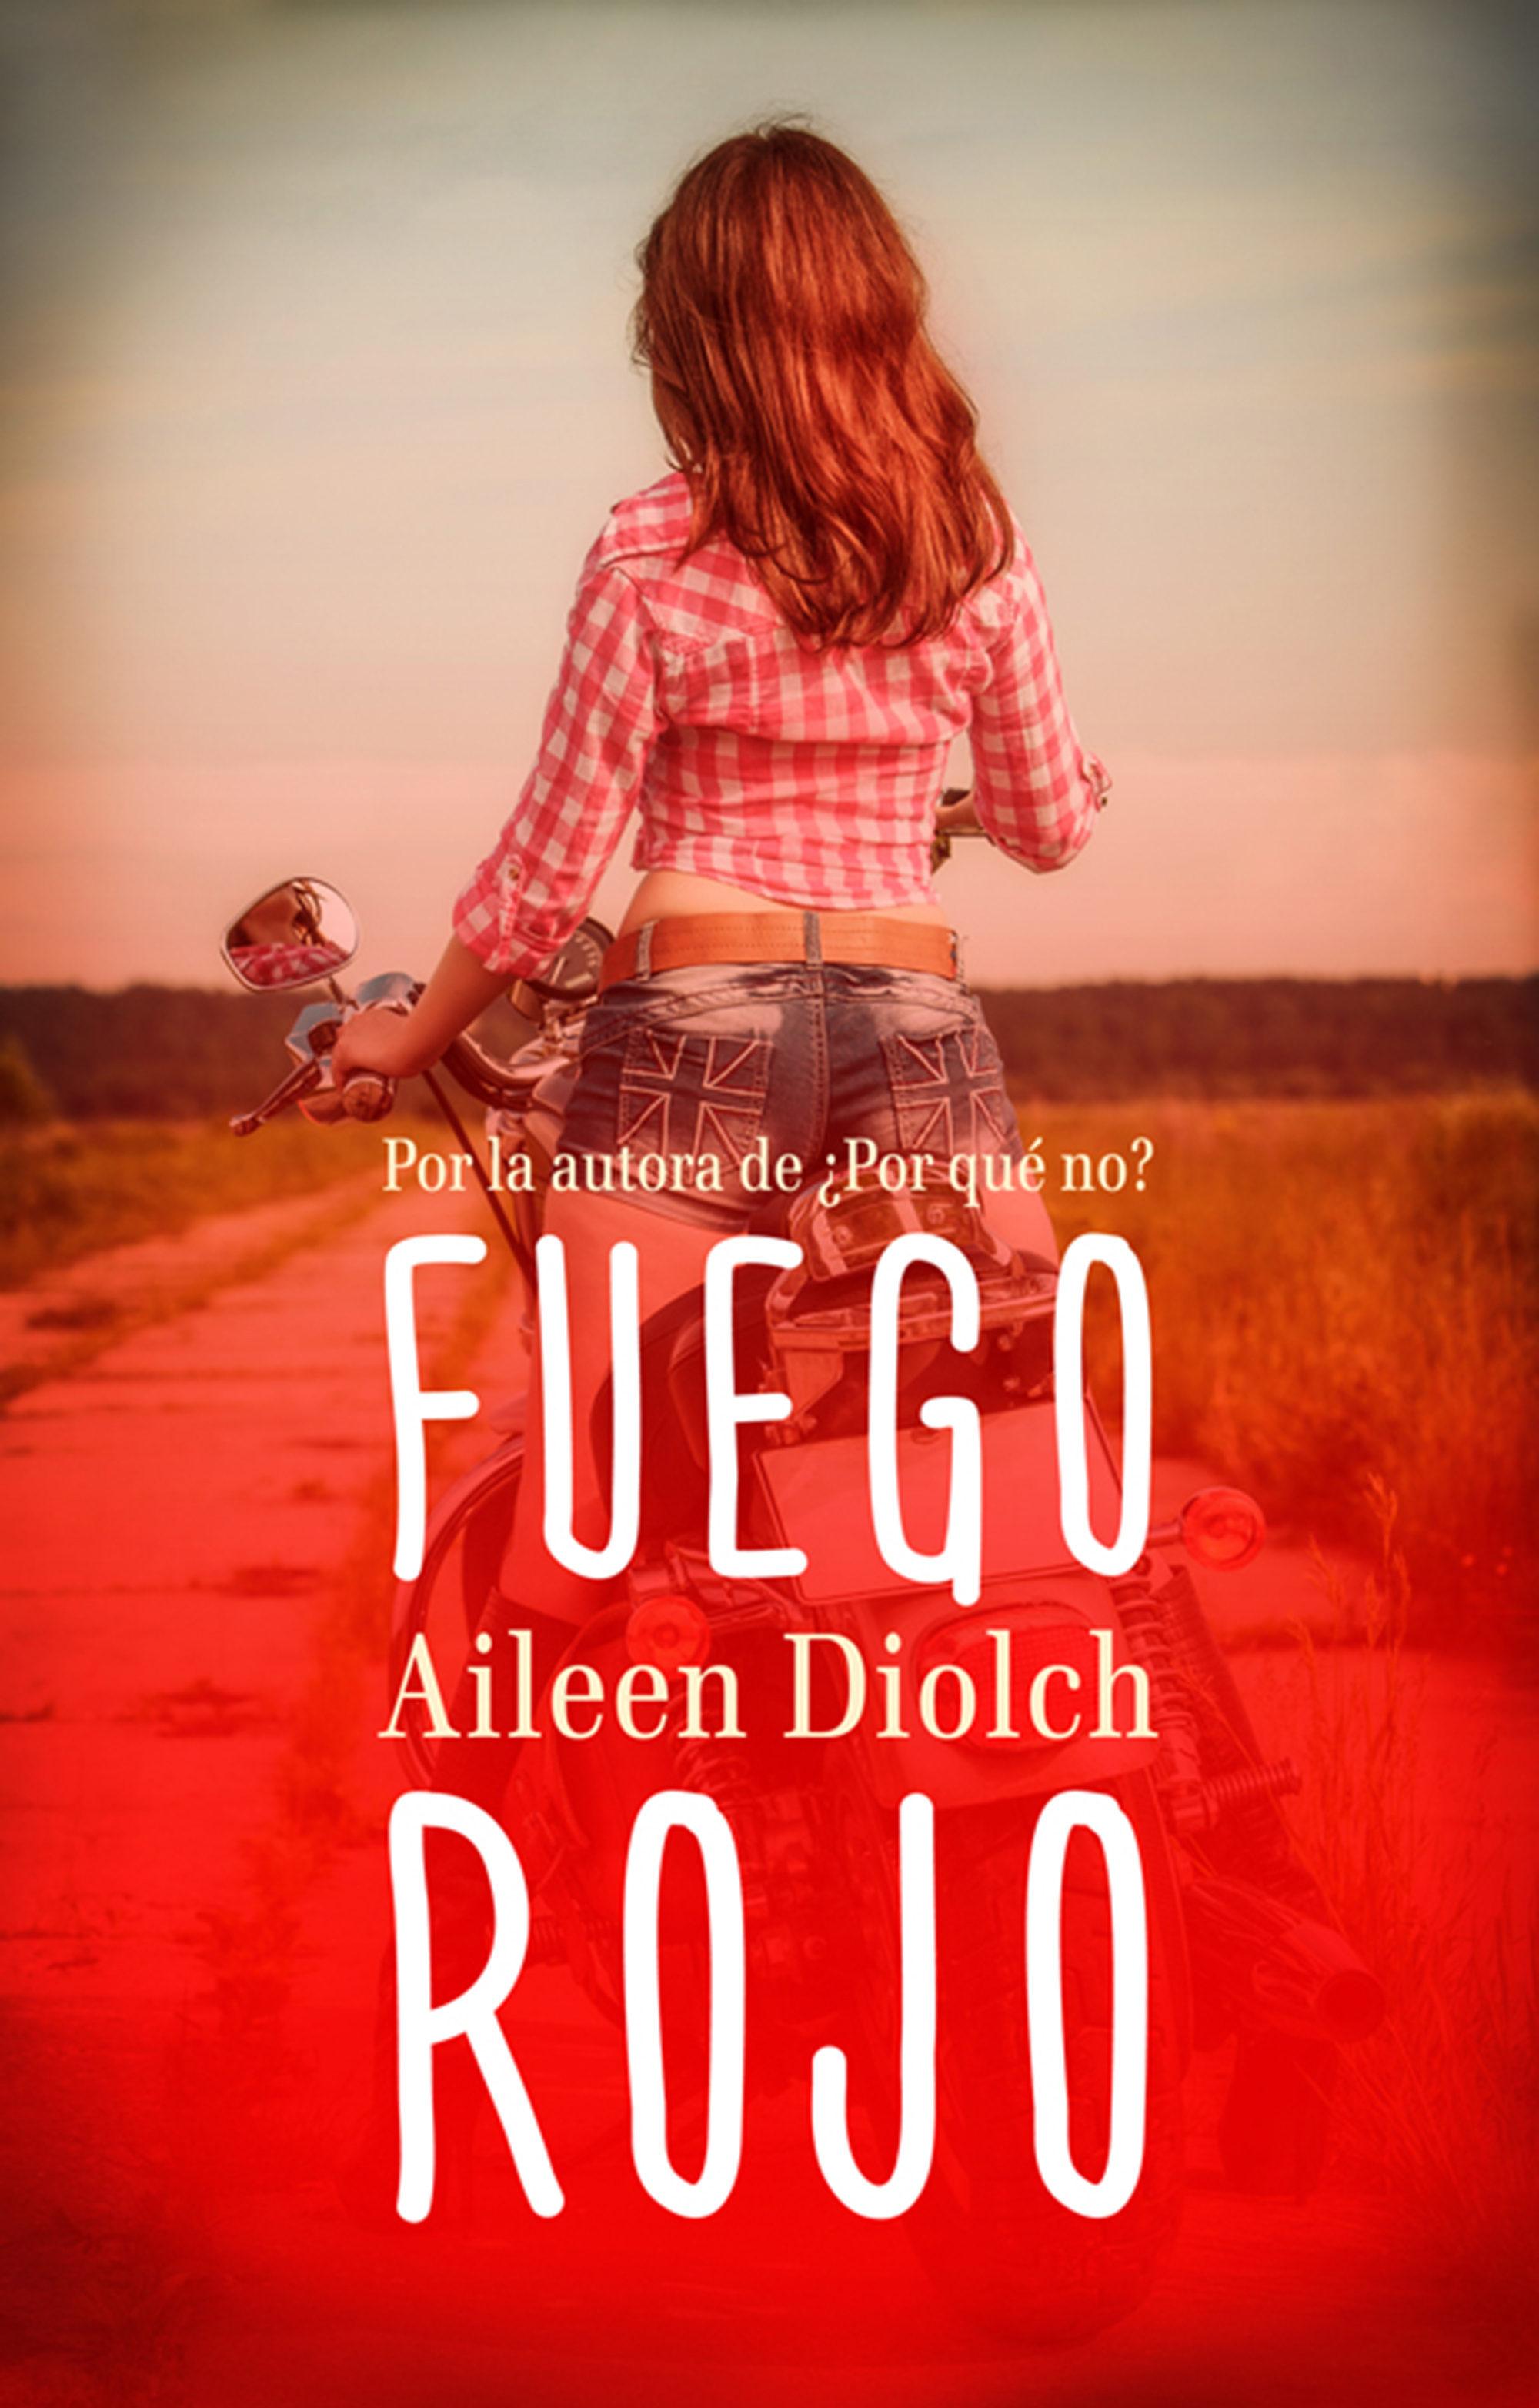 Fuego rojo - Aileen Diolch (Rom) 9788415952732